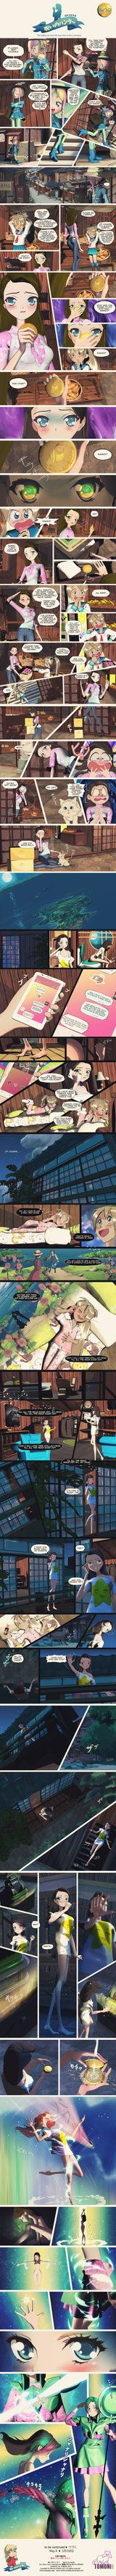 Noroi No Hanta - Page 16-30 by MichiruBokido.deviantart.com on @DeviantArt